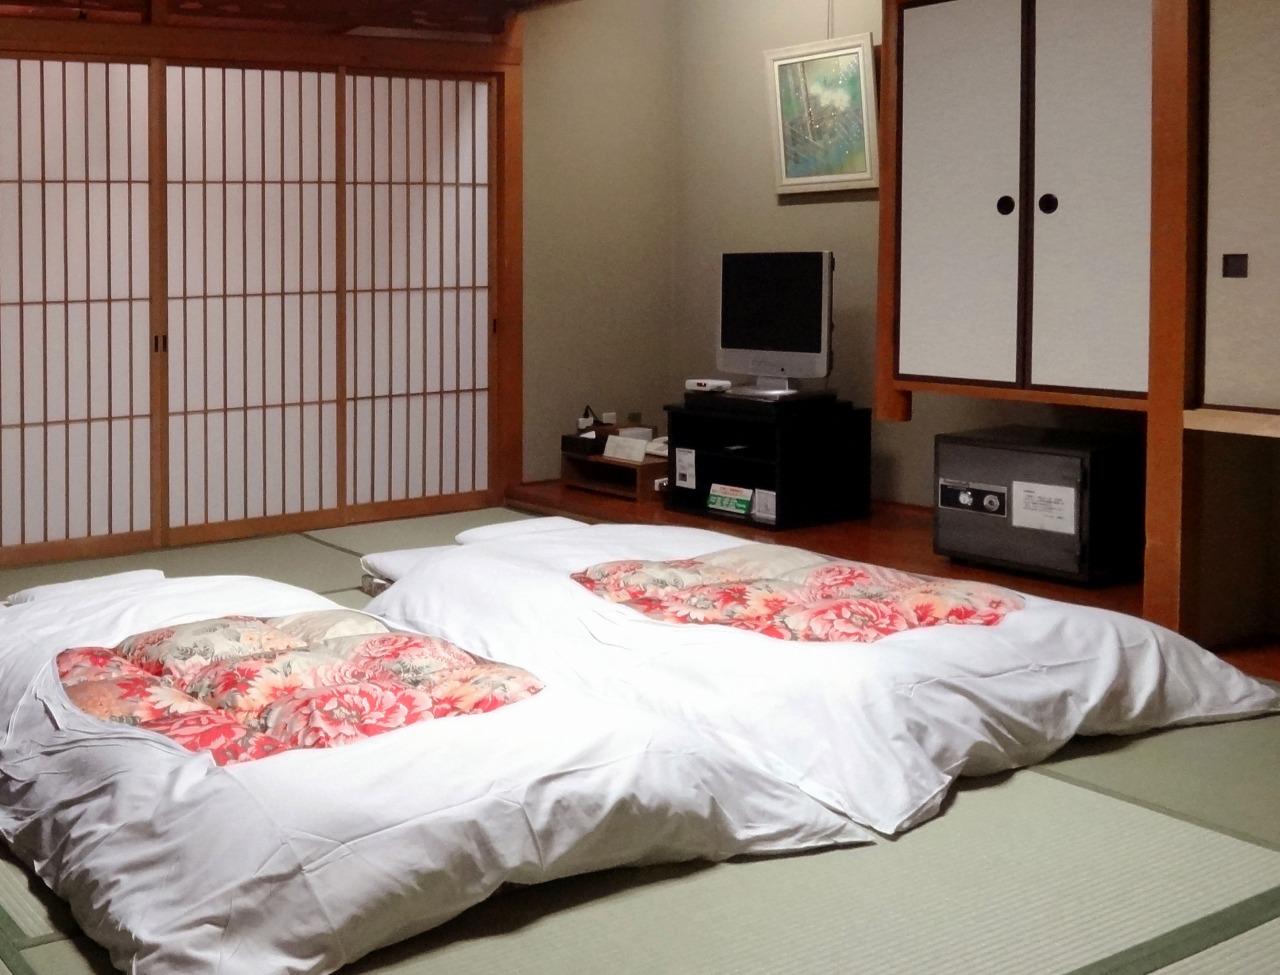 image via 京都 旅館 石長松菊園